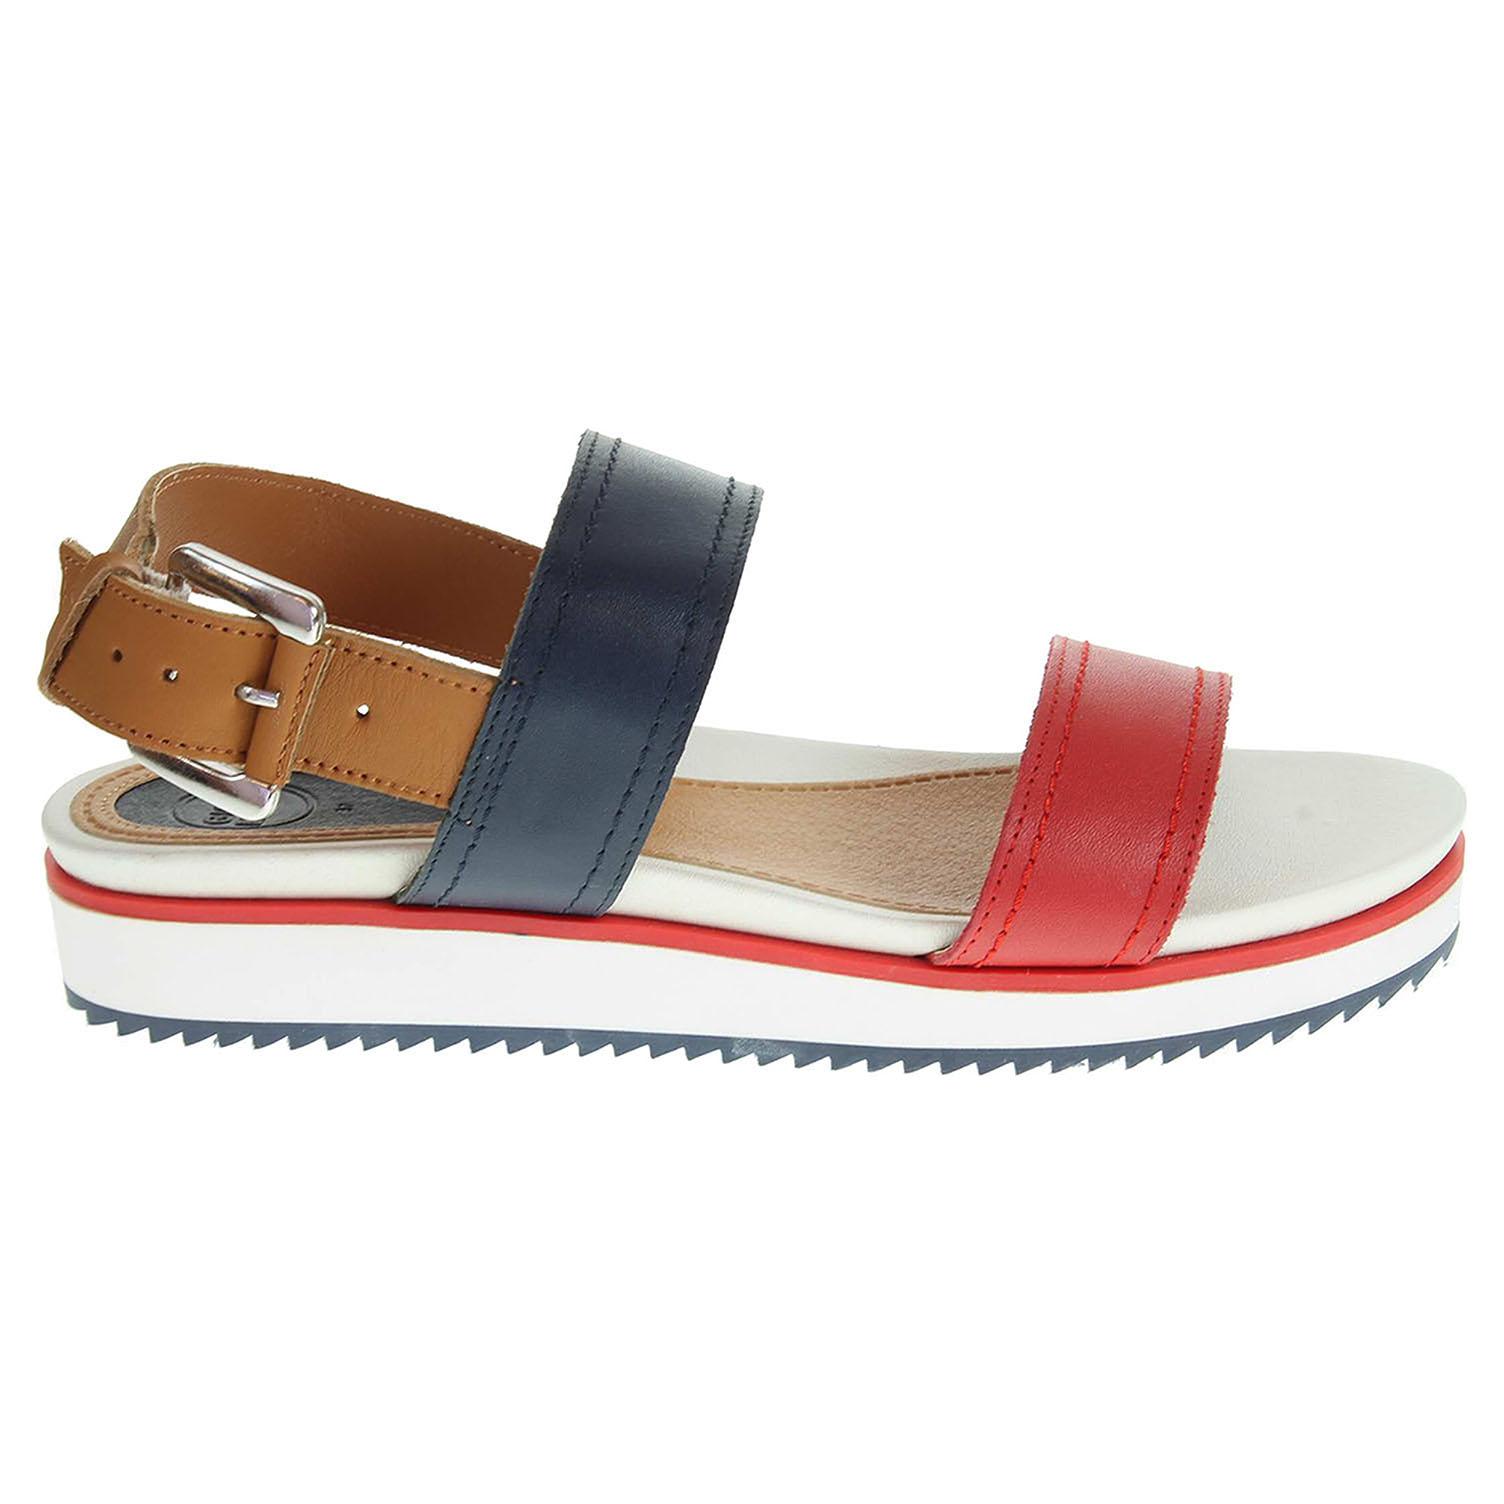 Gioseppo Mundaka dámské sandály multicolor 41